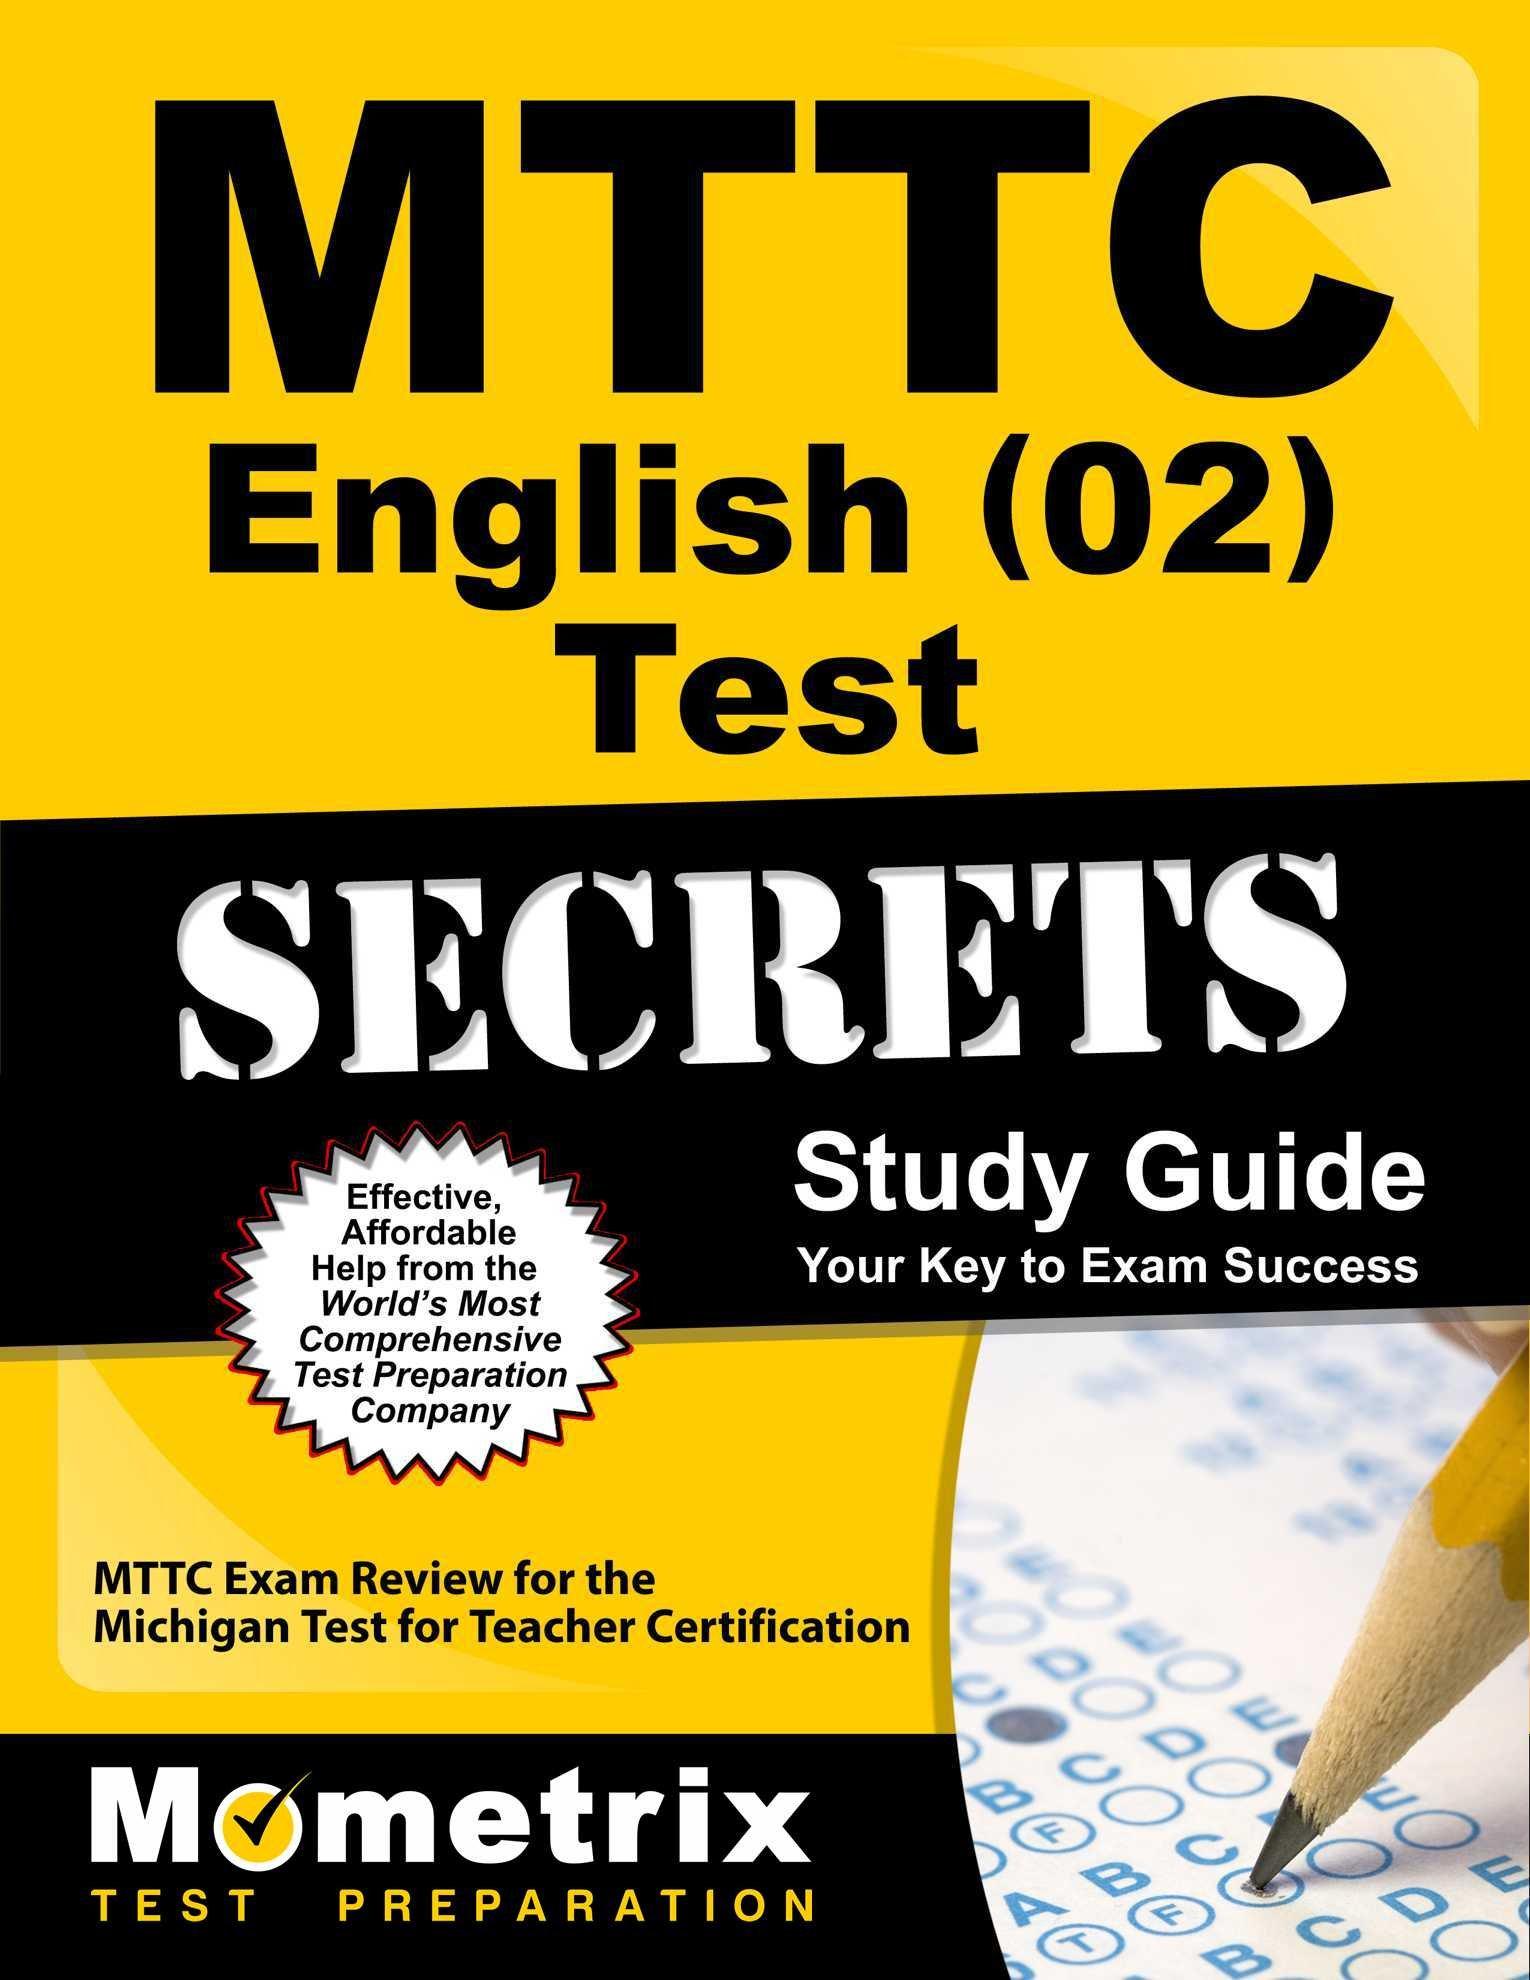 MTTC English Secrets Study Guide product image